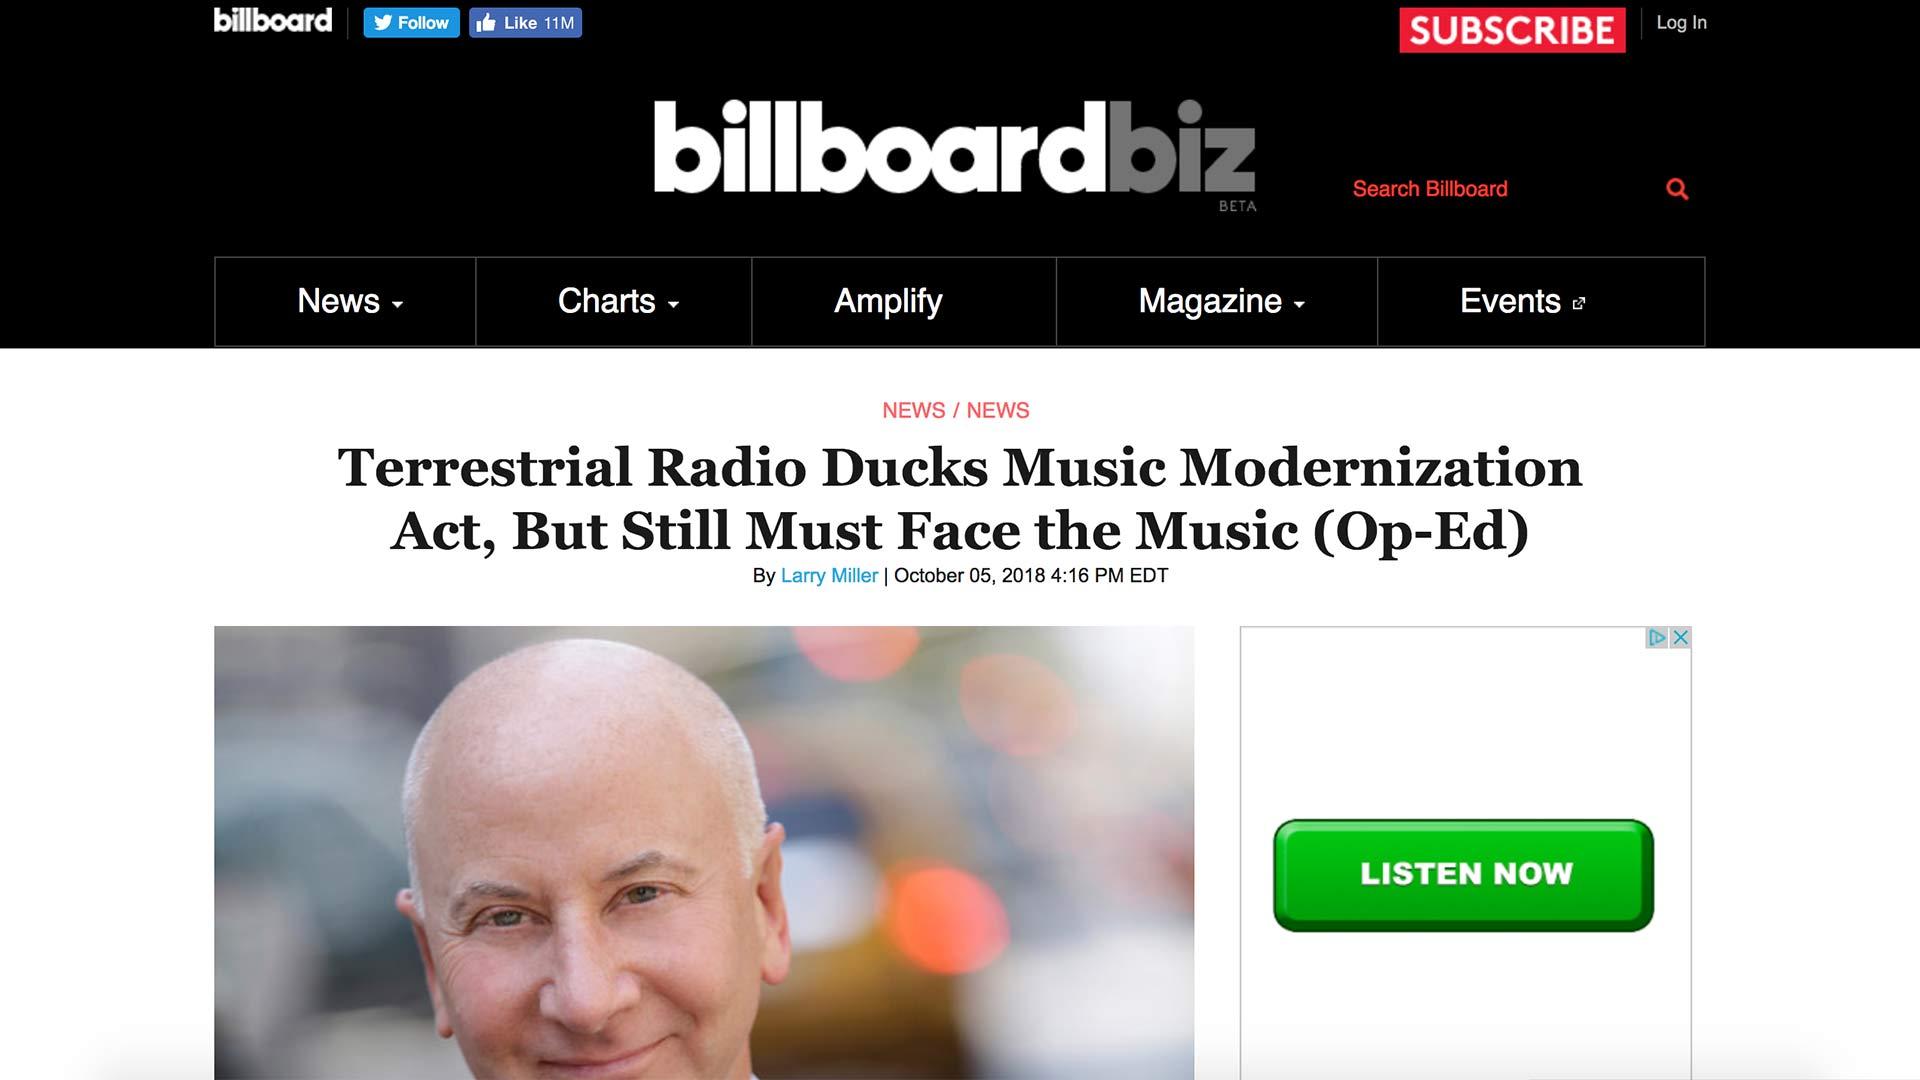 Fairness Rocks News Terrestrial Radio Ducks Music Modernization Act, But Still Must Face the Music (Op-Ed)